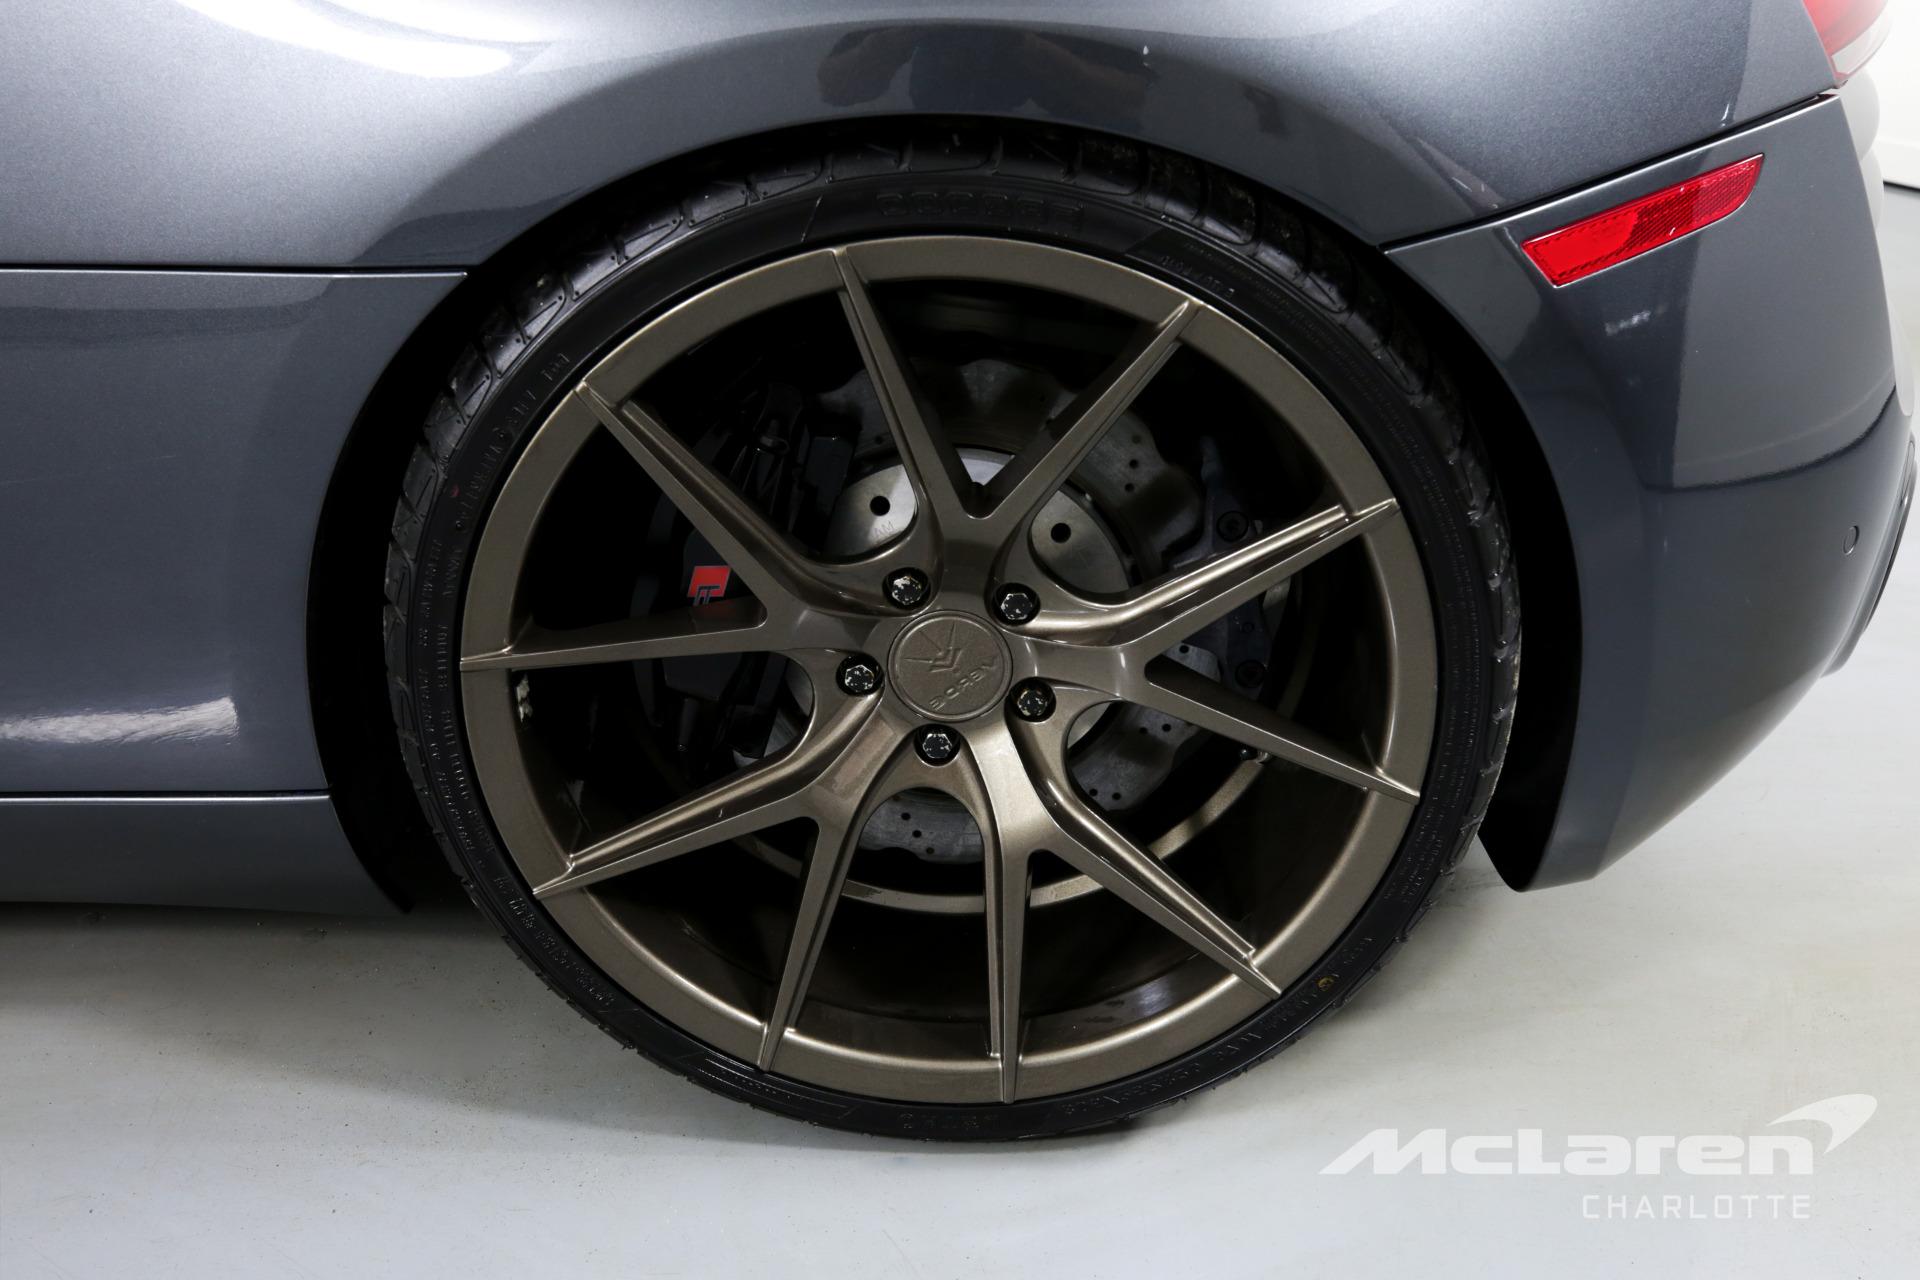 Used 2014 Audi R8 4.2 quattro Spyder | Charlotte, NC